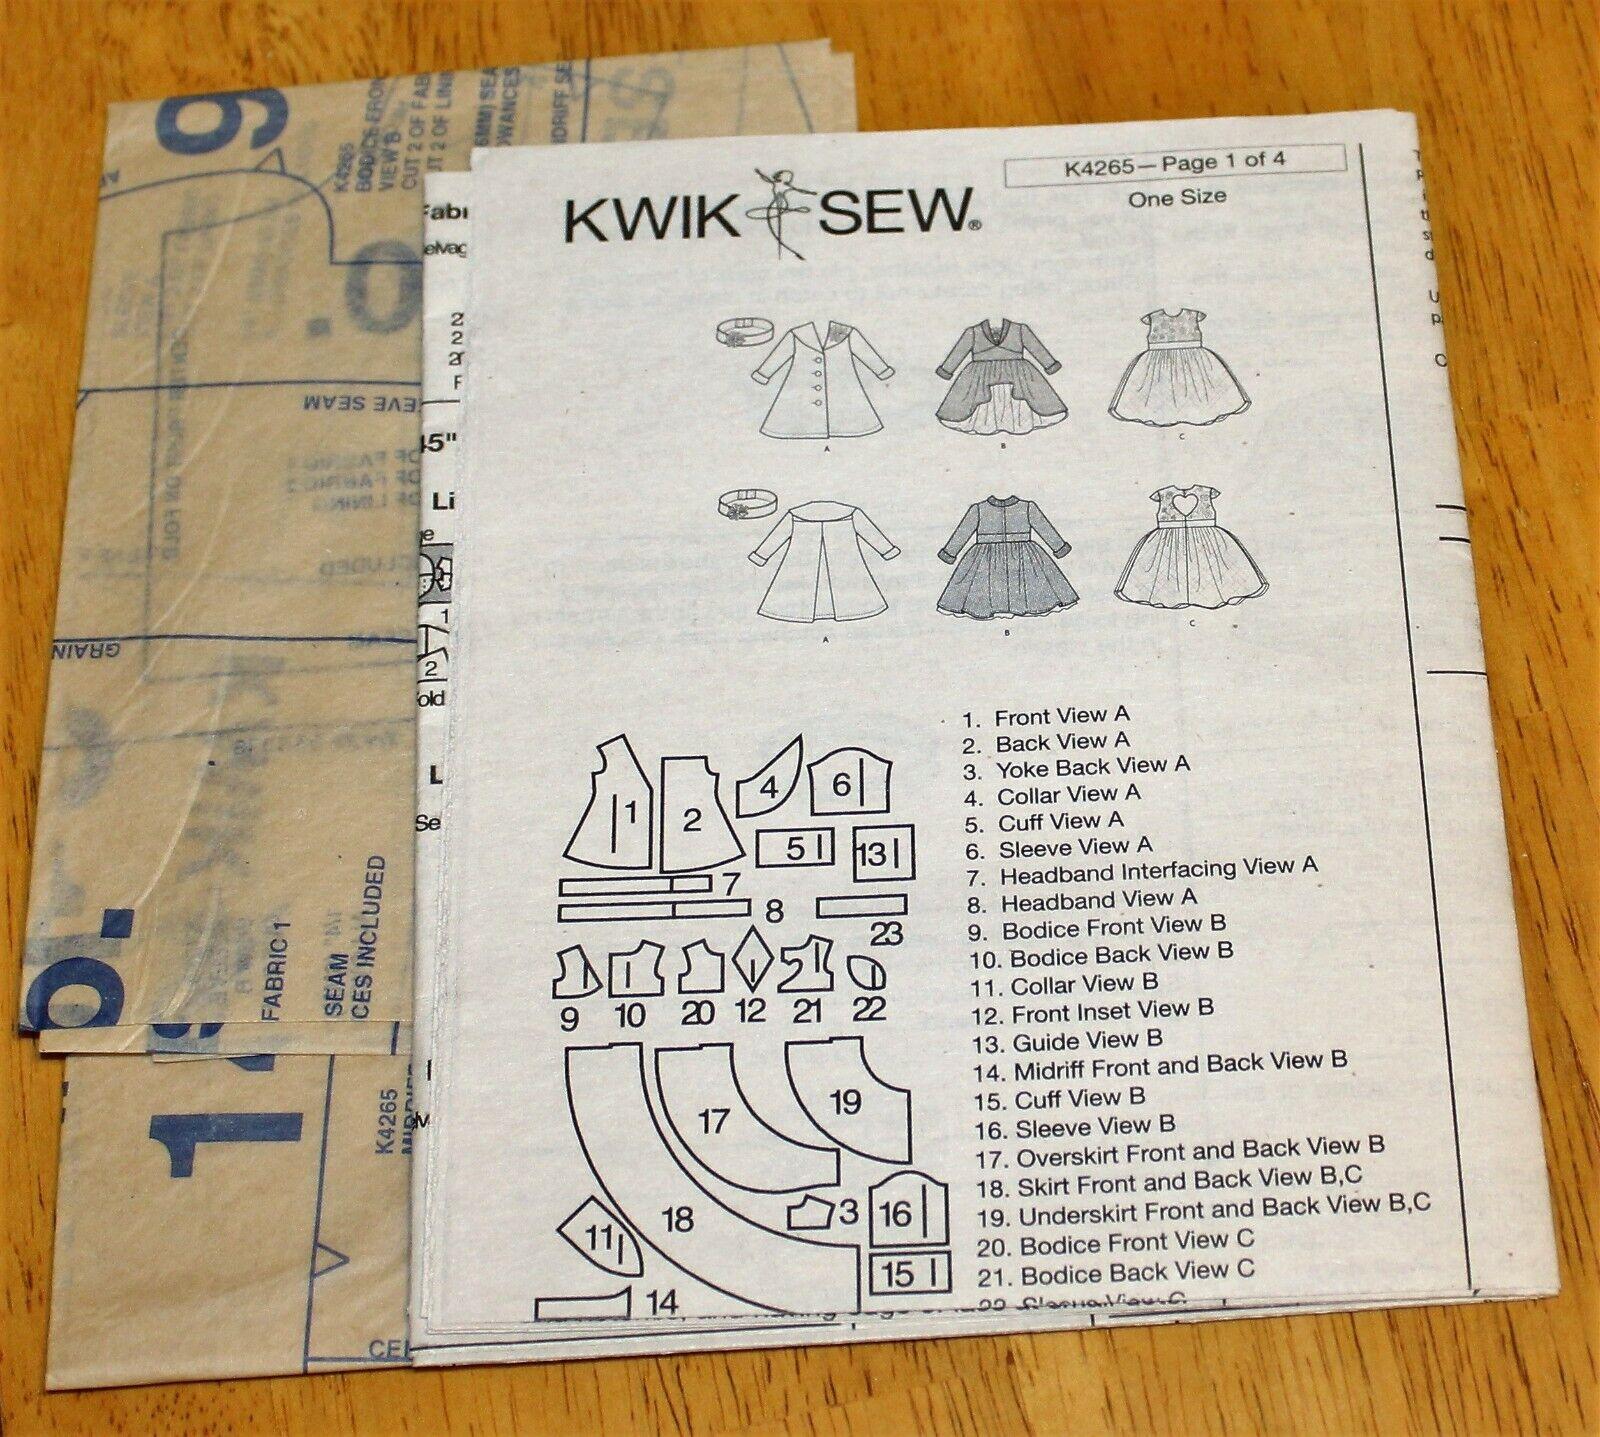 Kwik-Sew PATTERN K4265 DOLL CLOTHES FOR 18 DOLLS - Dresses Coat - NEW  - $4.59